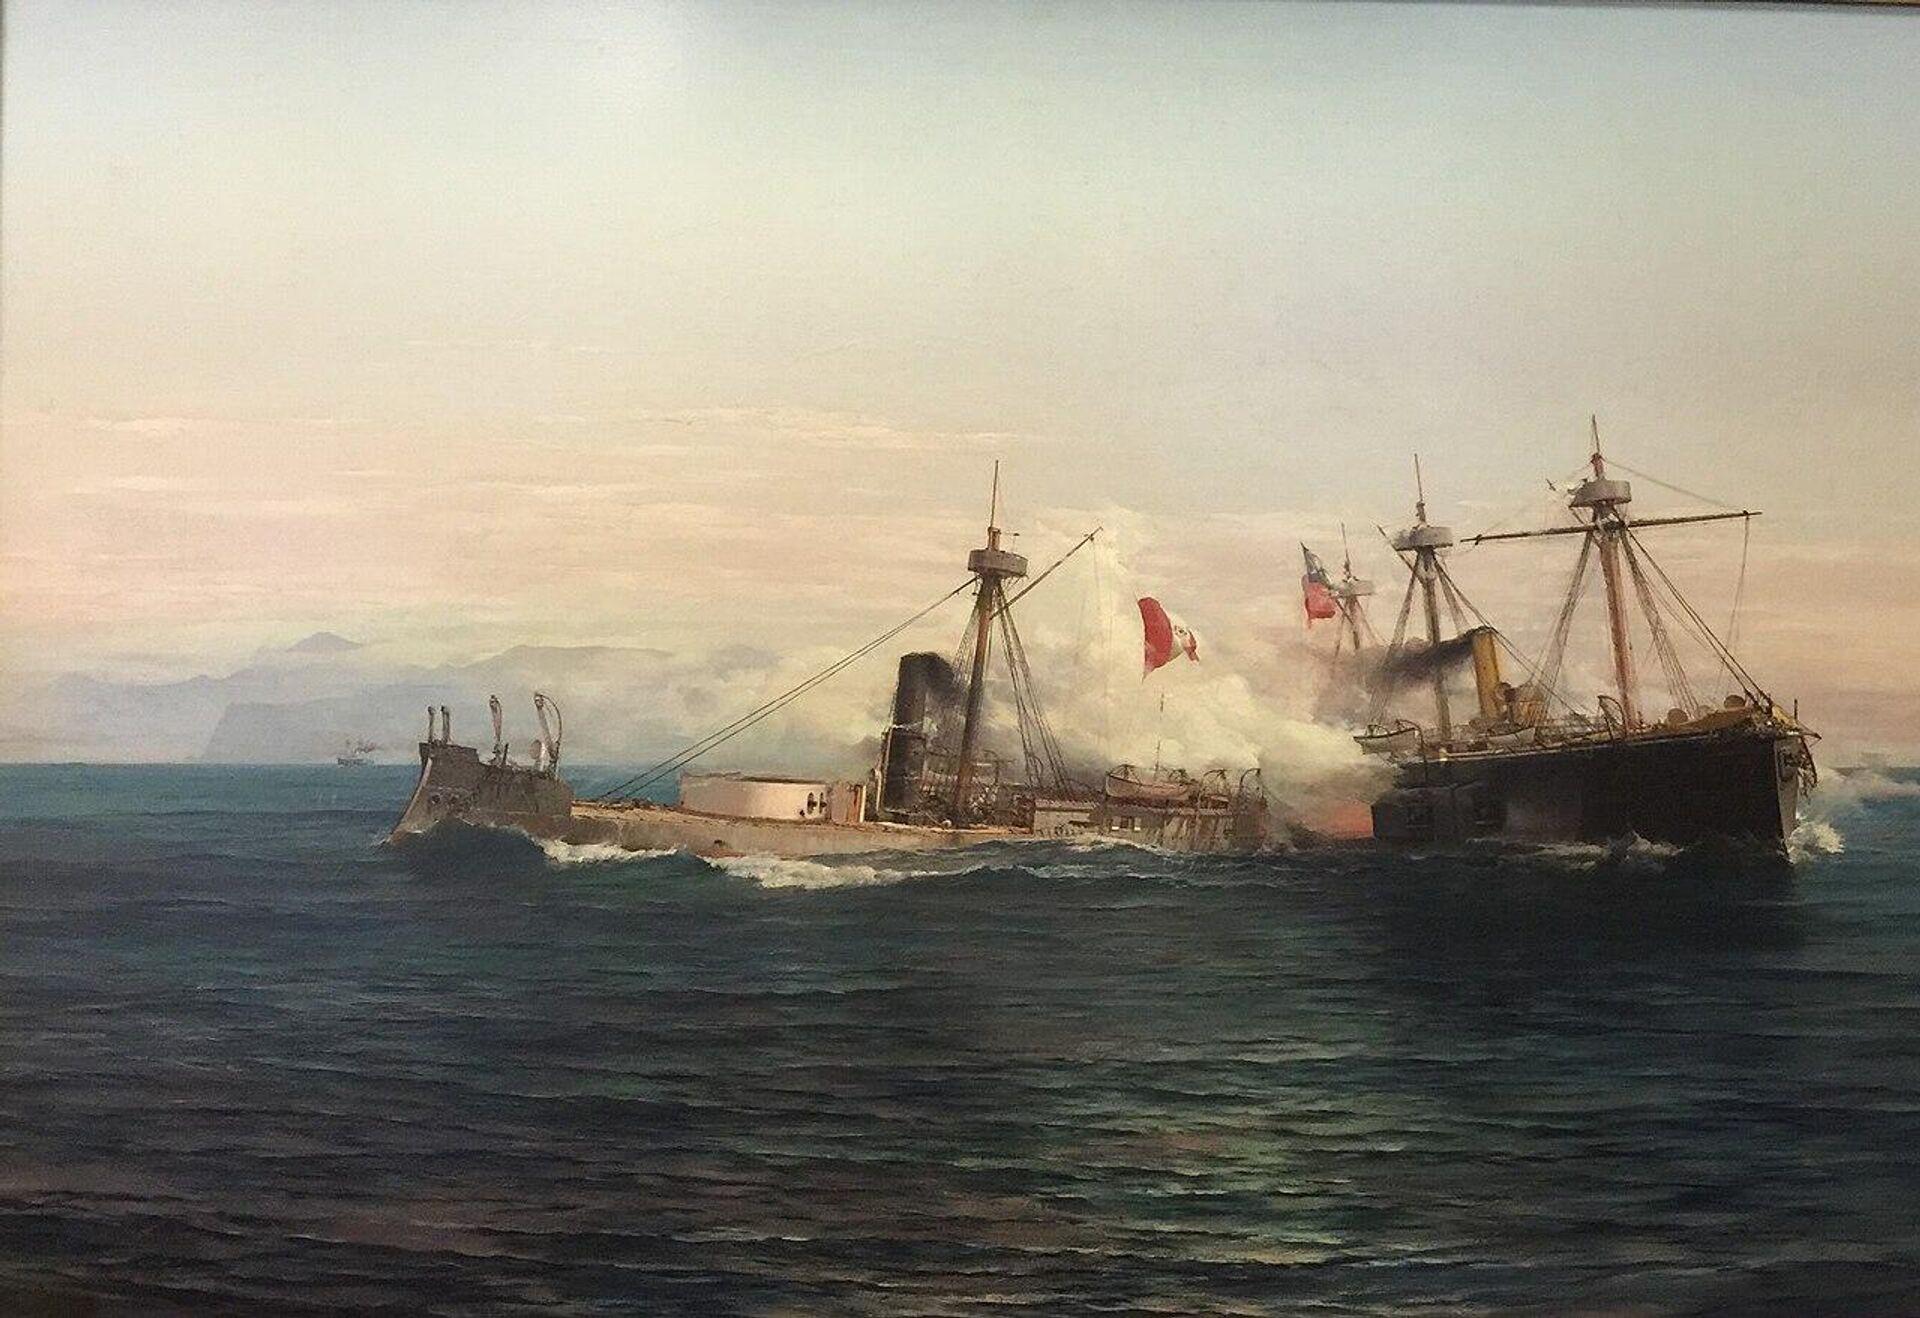 Combate naval de Angamos - Sputnik Mundo, 1920, 07.10.2021